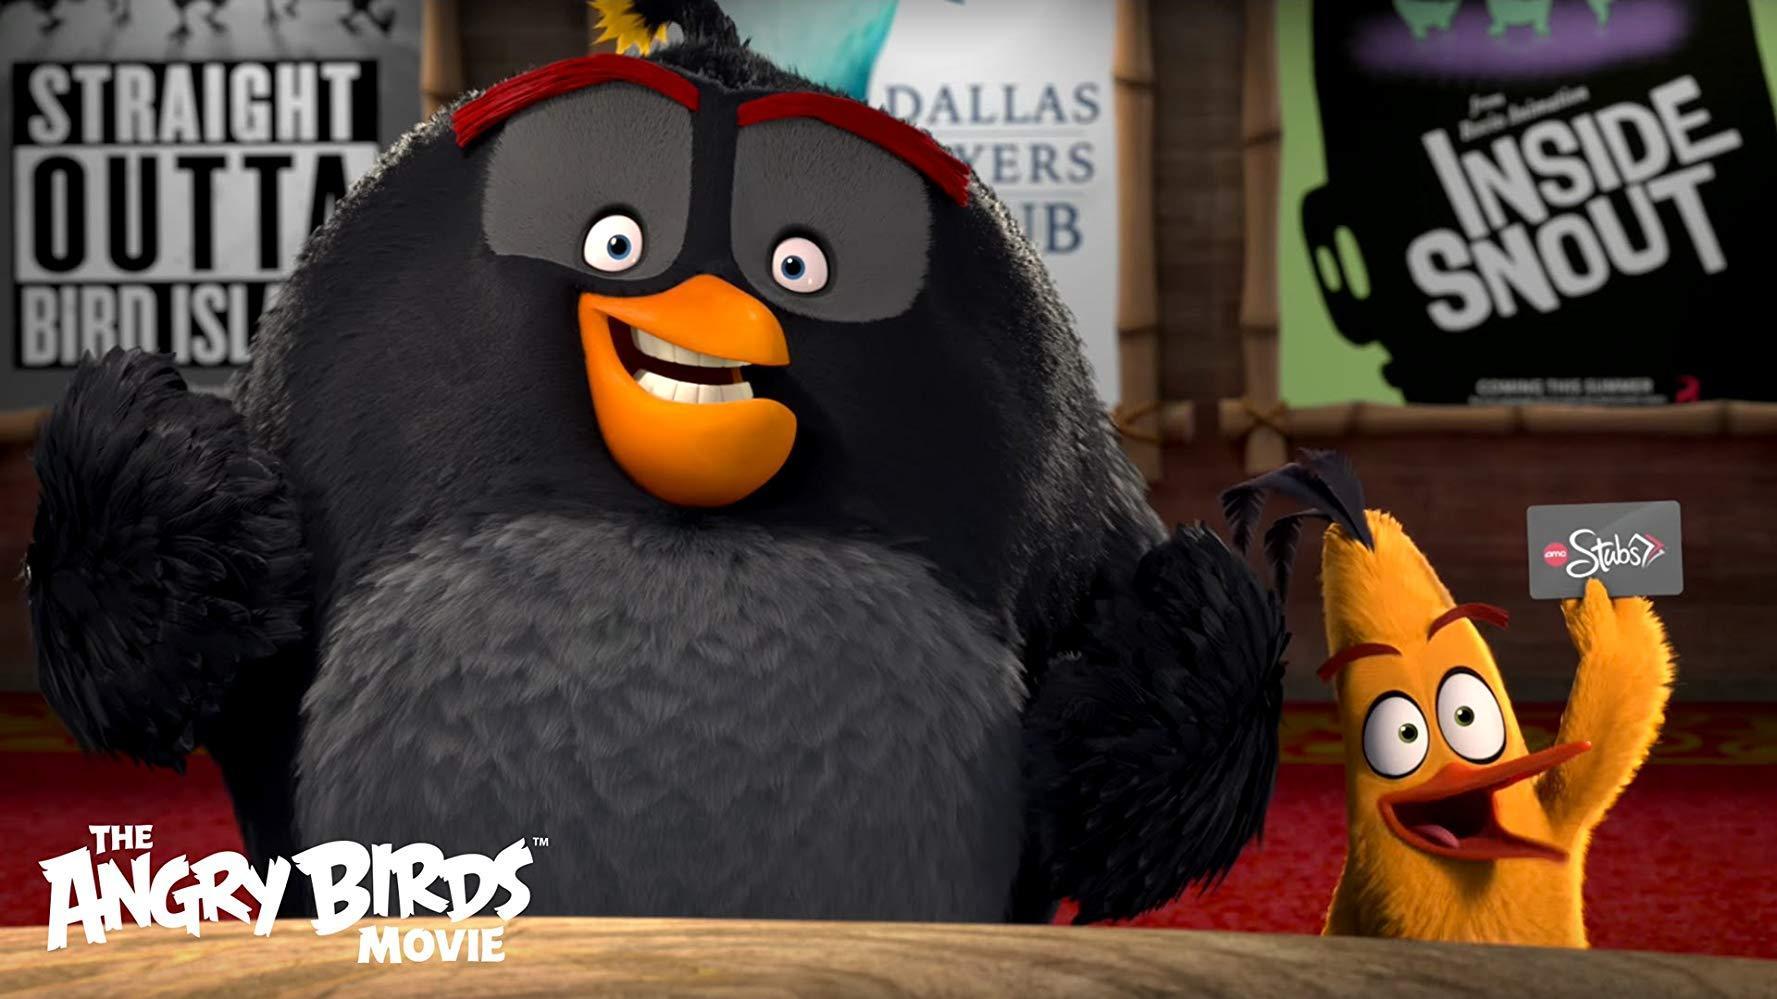 مشاهدة فيلم The Angry Birds Movie 2016 HD مترجم كامل اون لاين